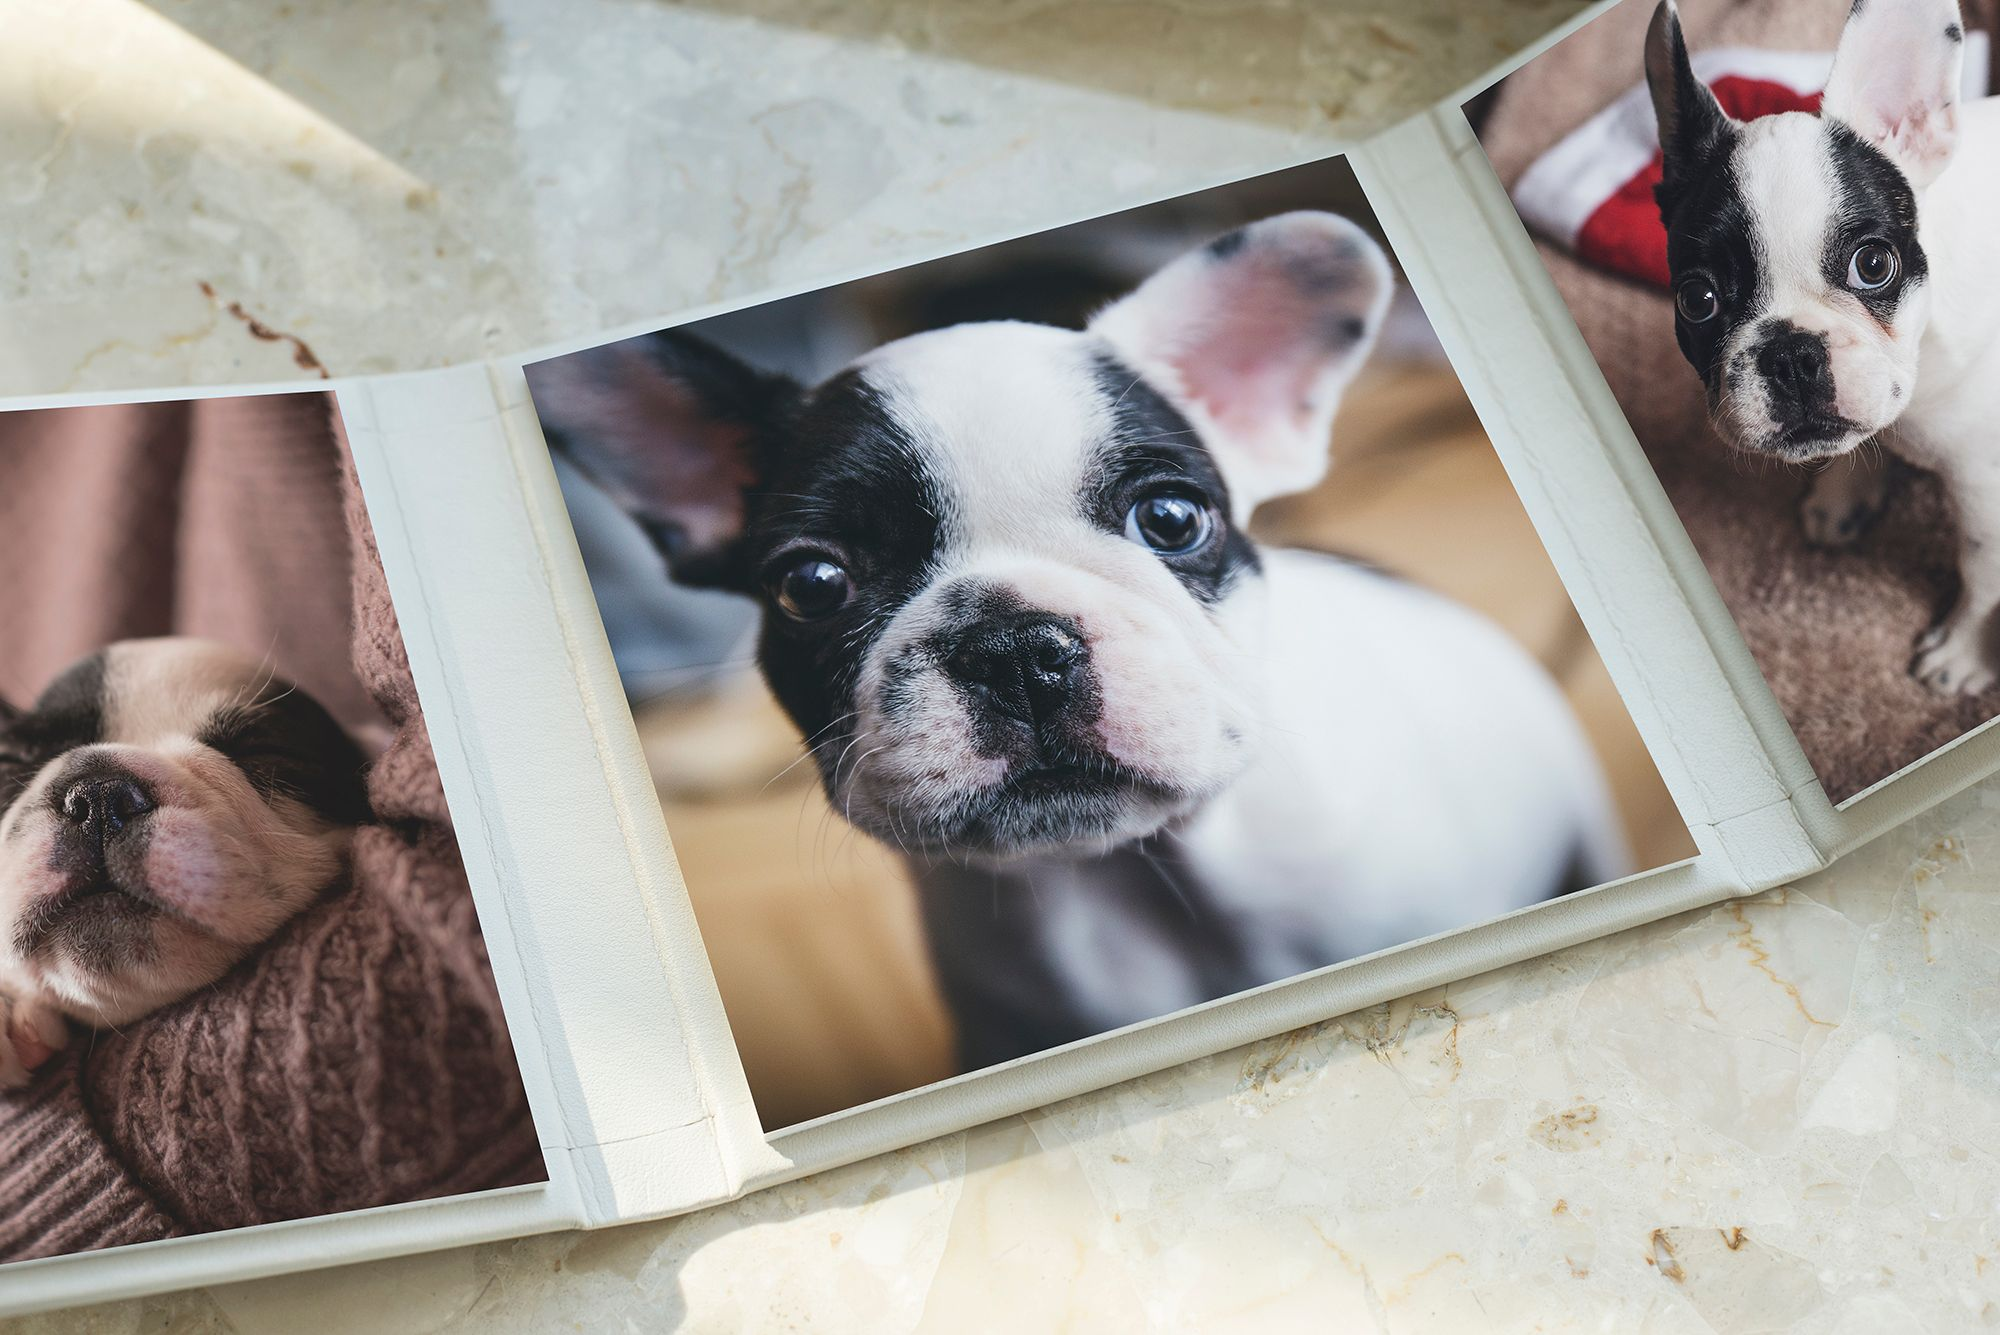 Triplex - Pet Photography